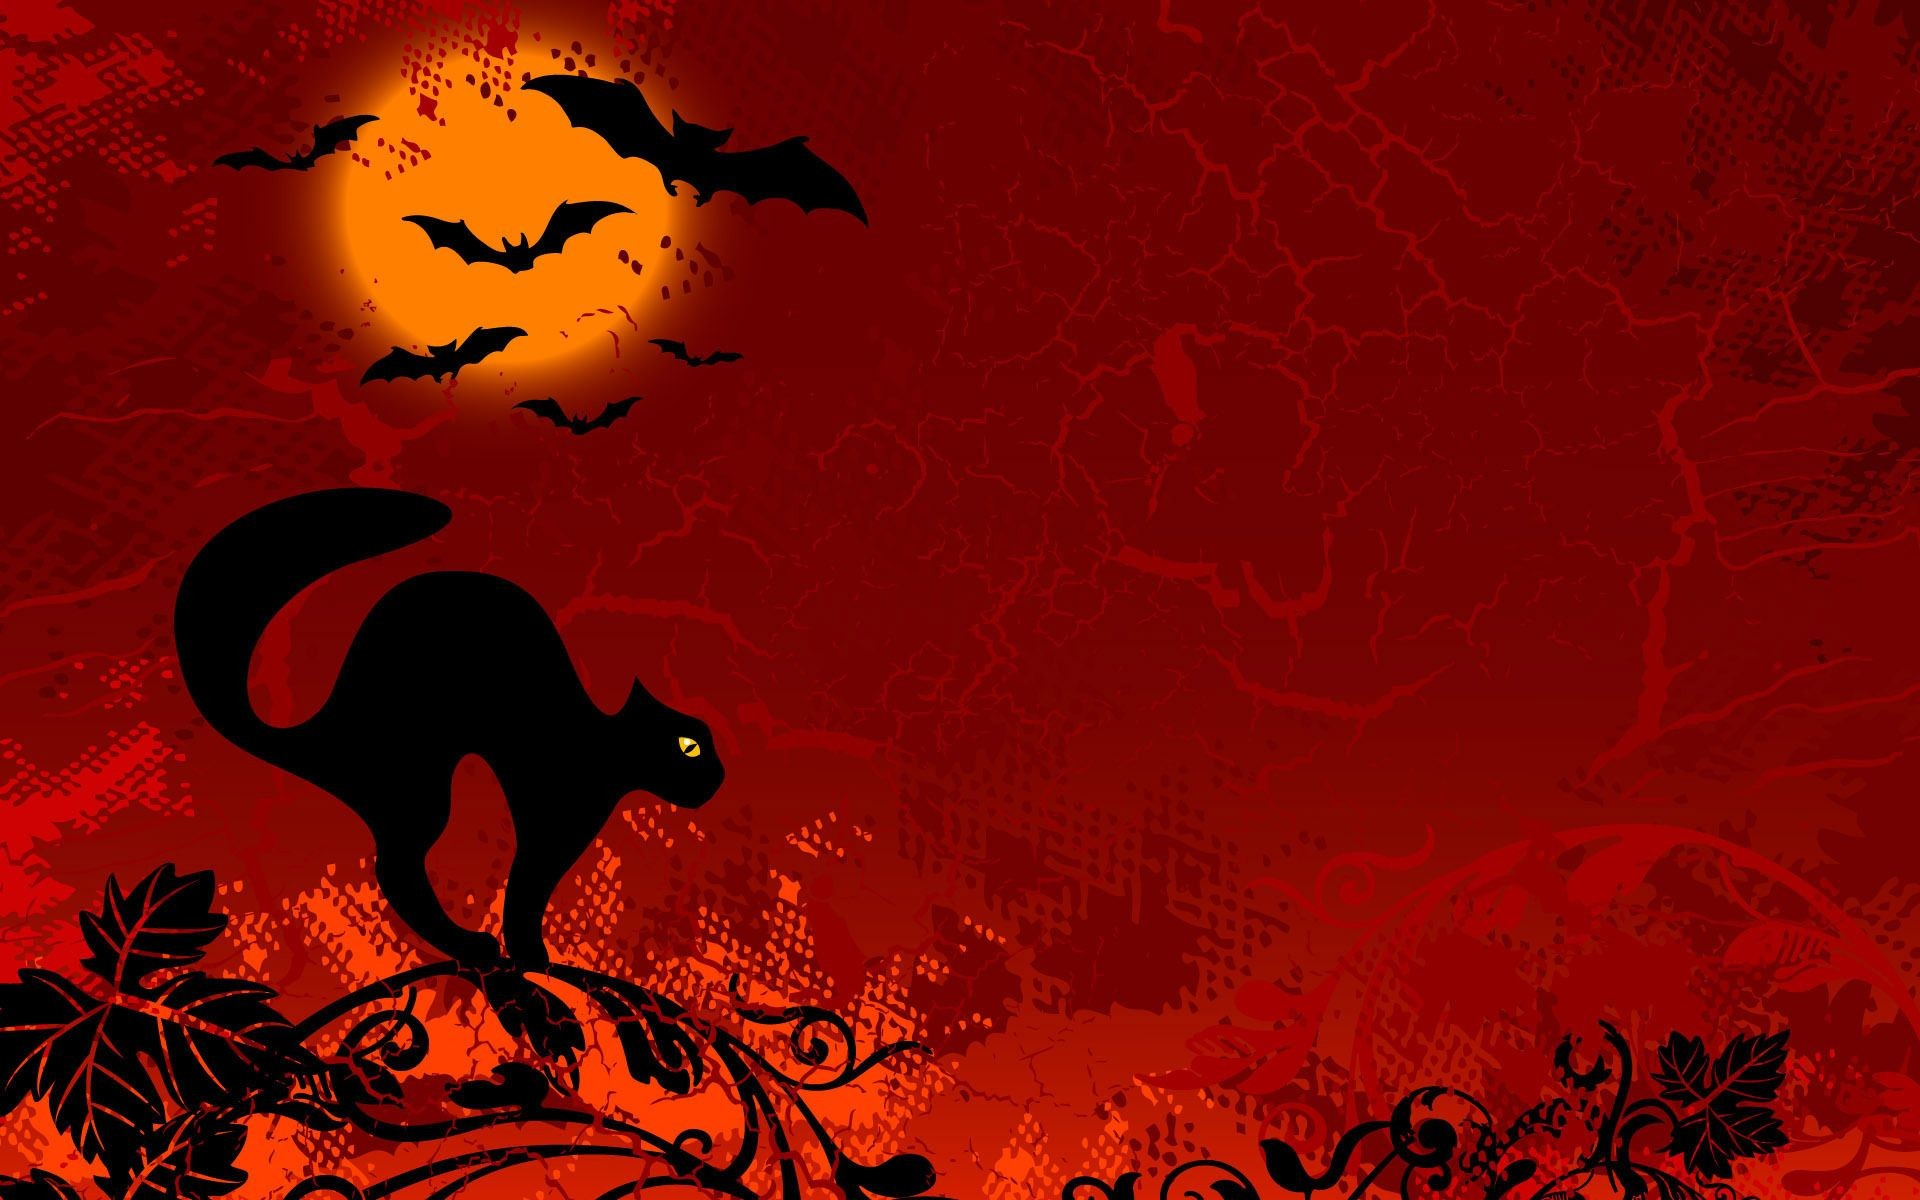 Res: 1920x1200, Halloween Wallpaper Picture